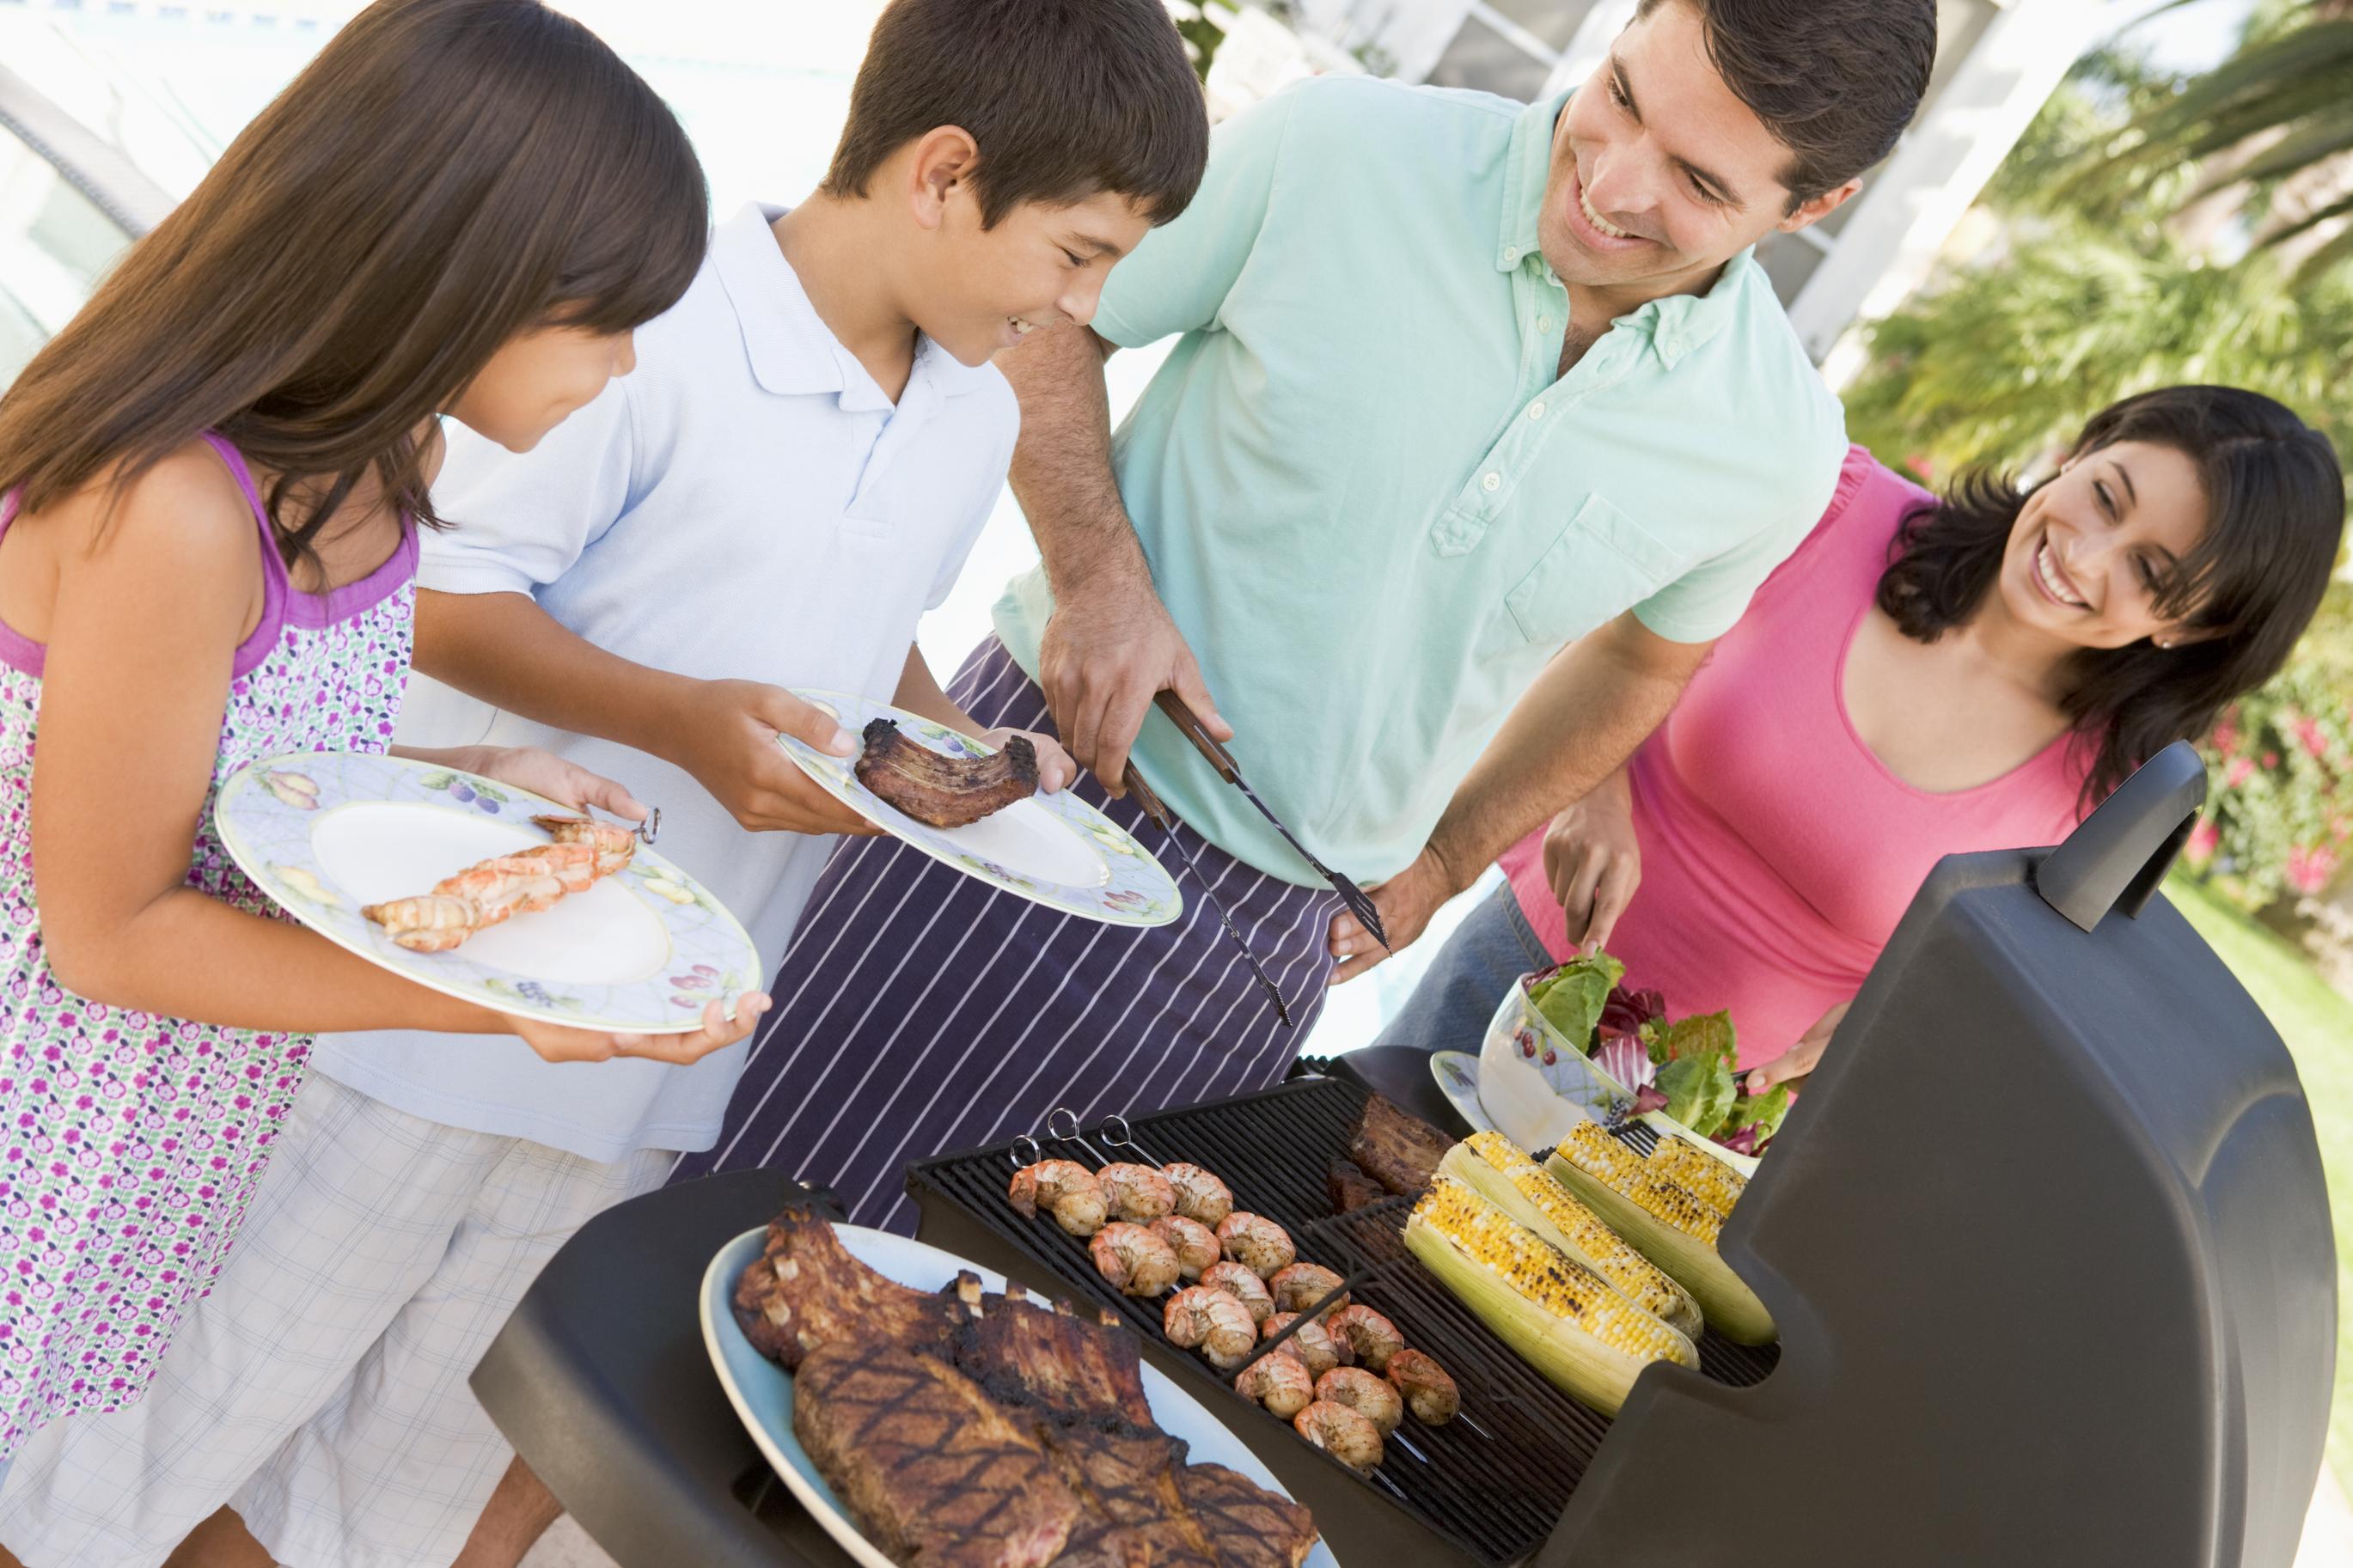 Family enjoying a barbecue.